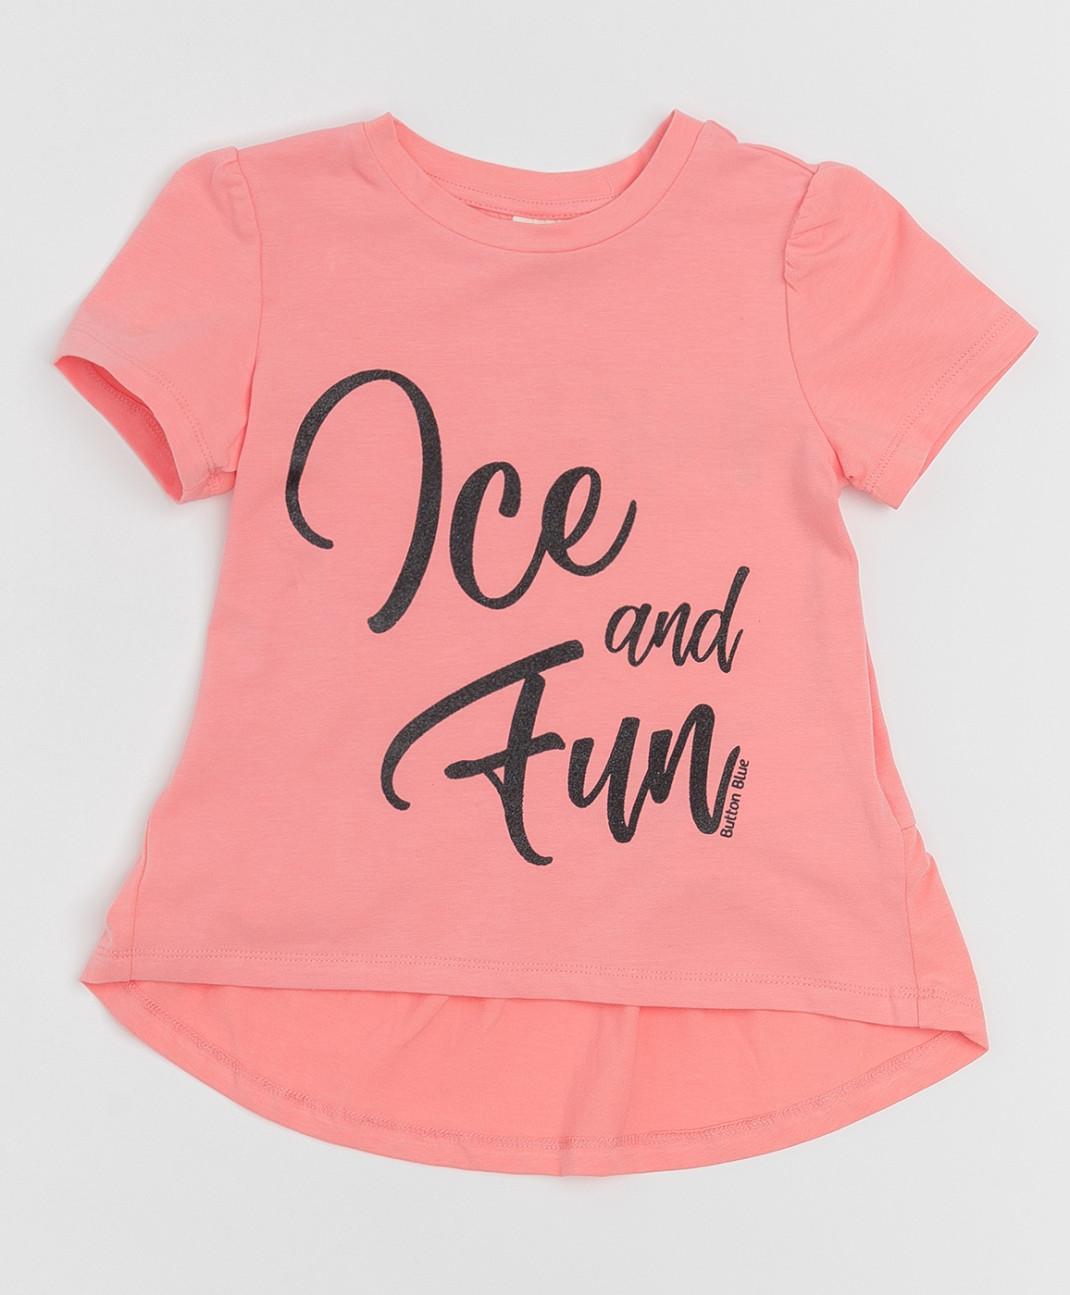 Button Blue Розовая футболка с глиттером Button Blue